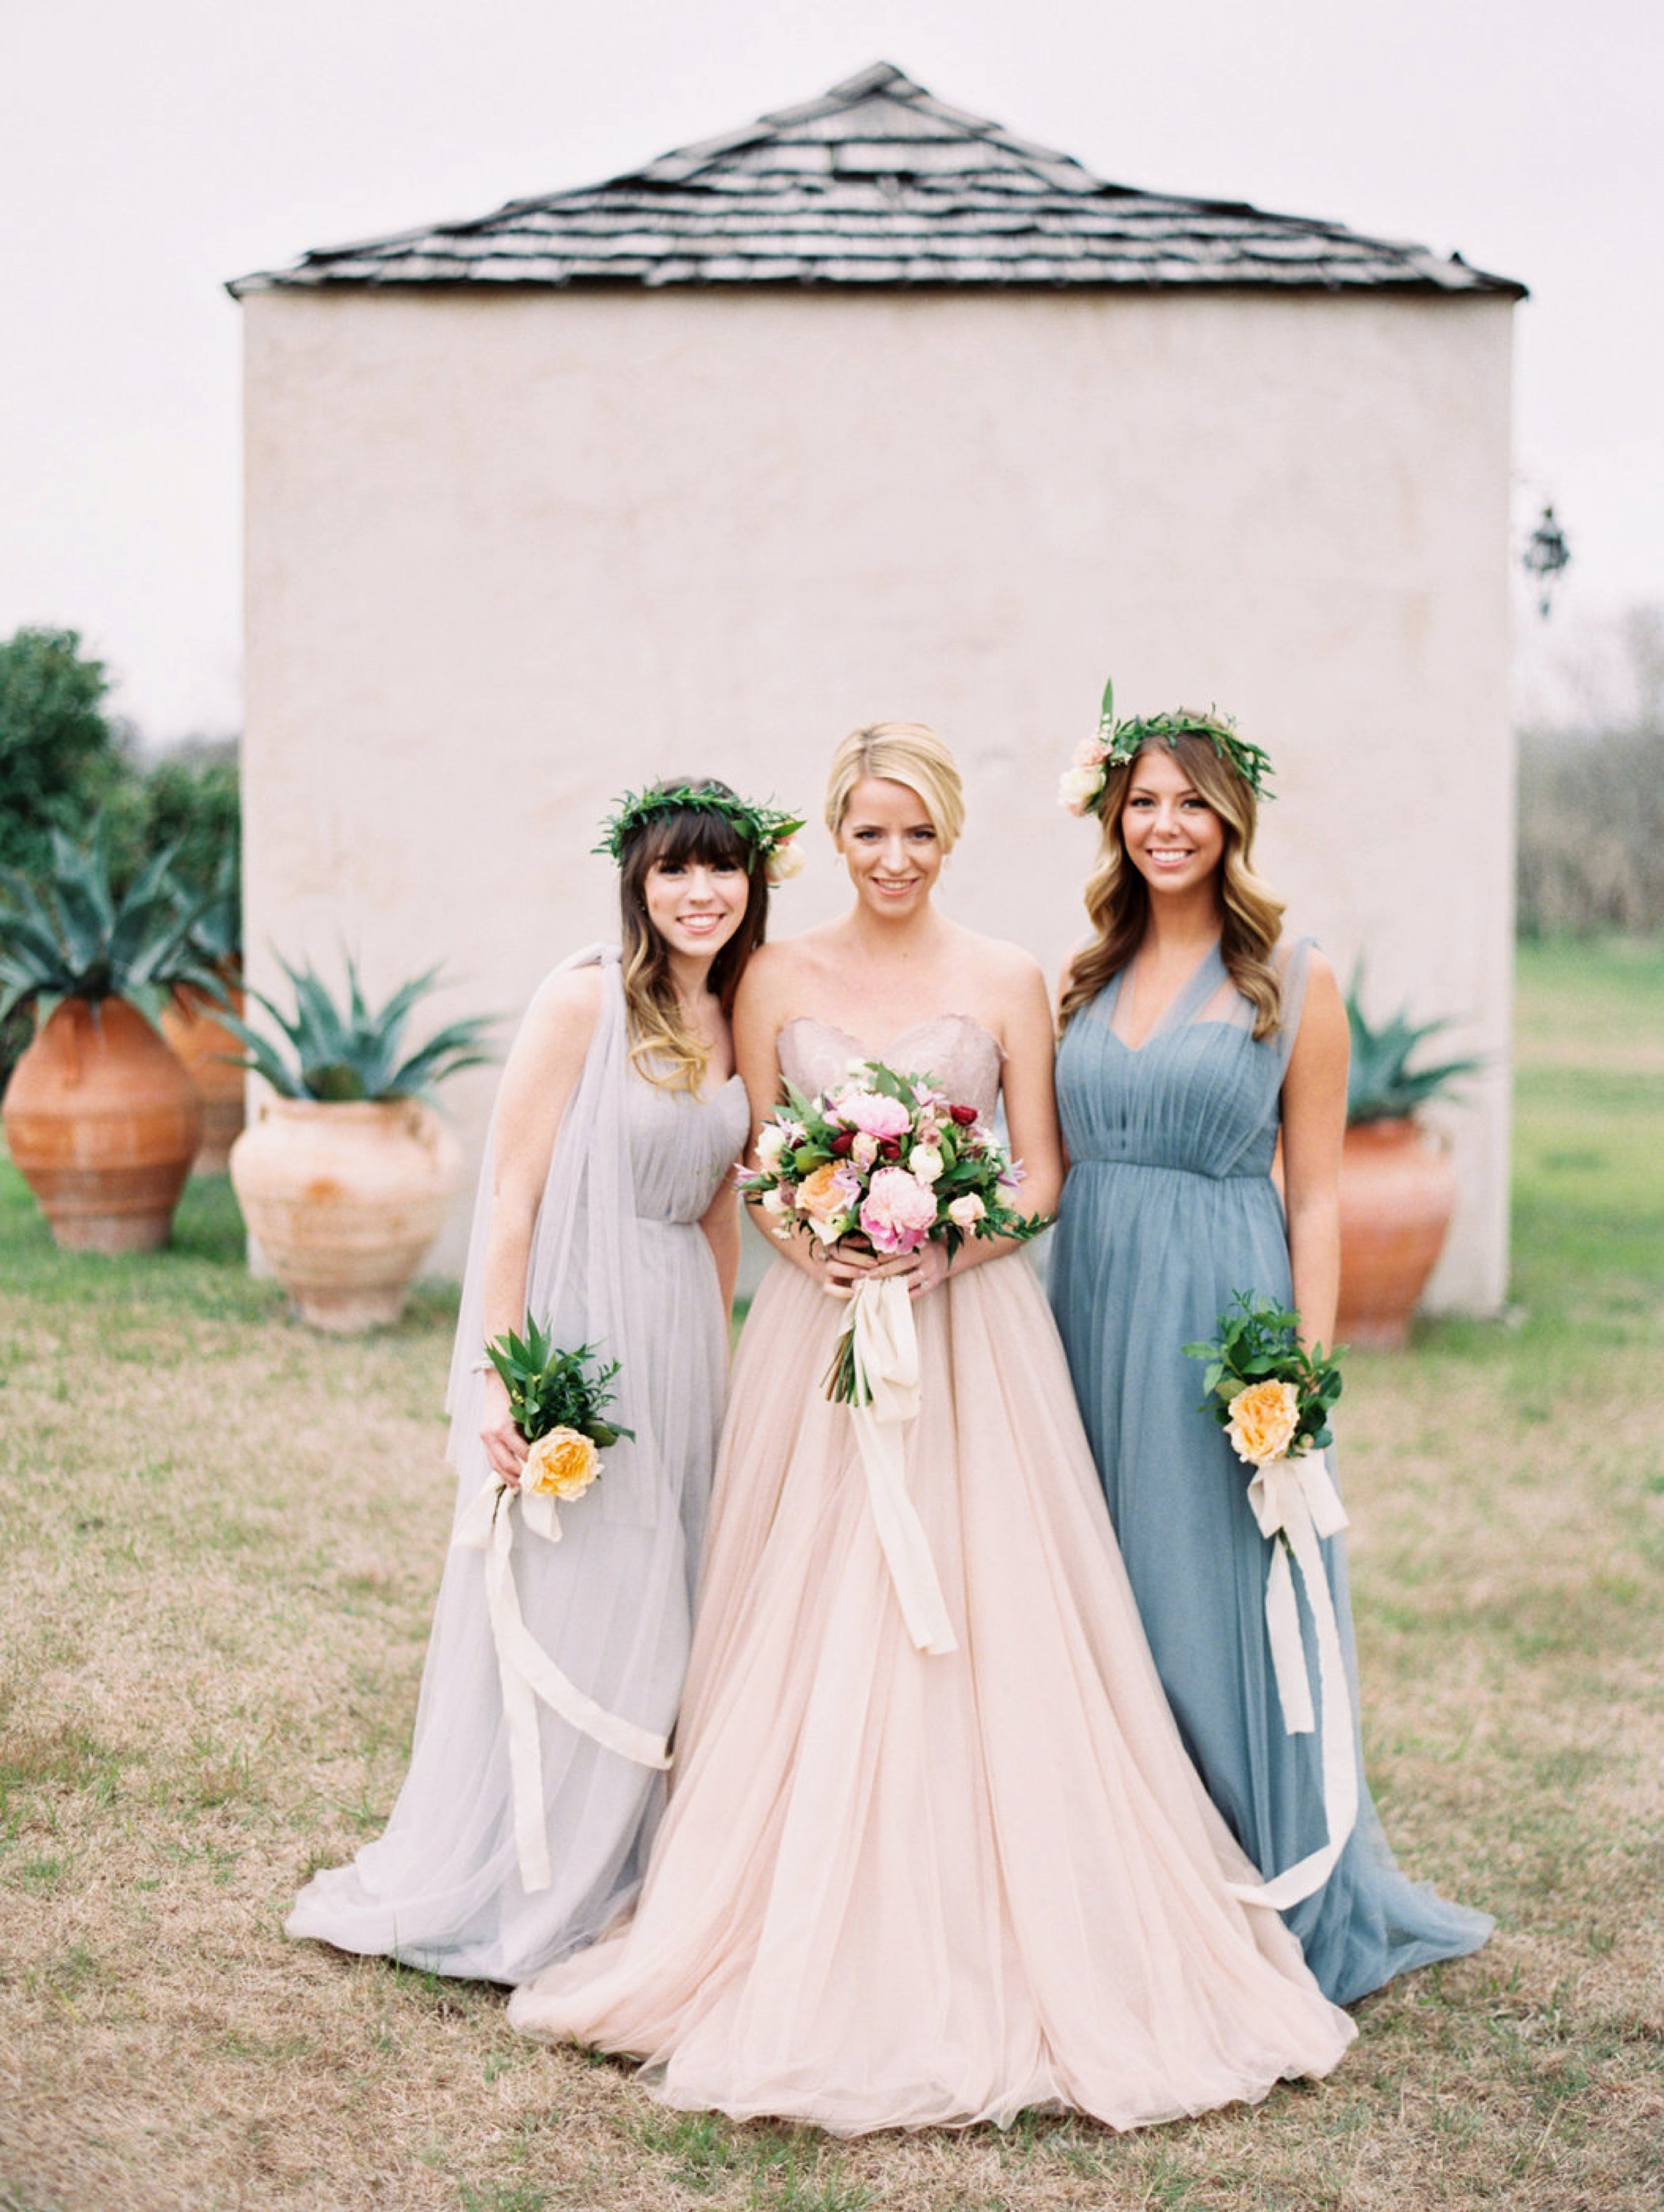 Annabelle Jenny Yoo, BHLDN Bride, Blush Wedding Dress, Austin Wedding Photographer, Le San Michele Wedding